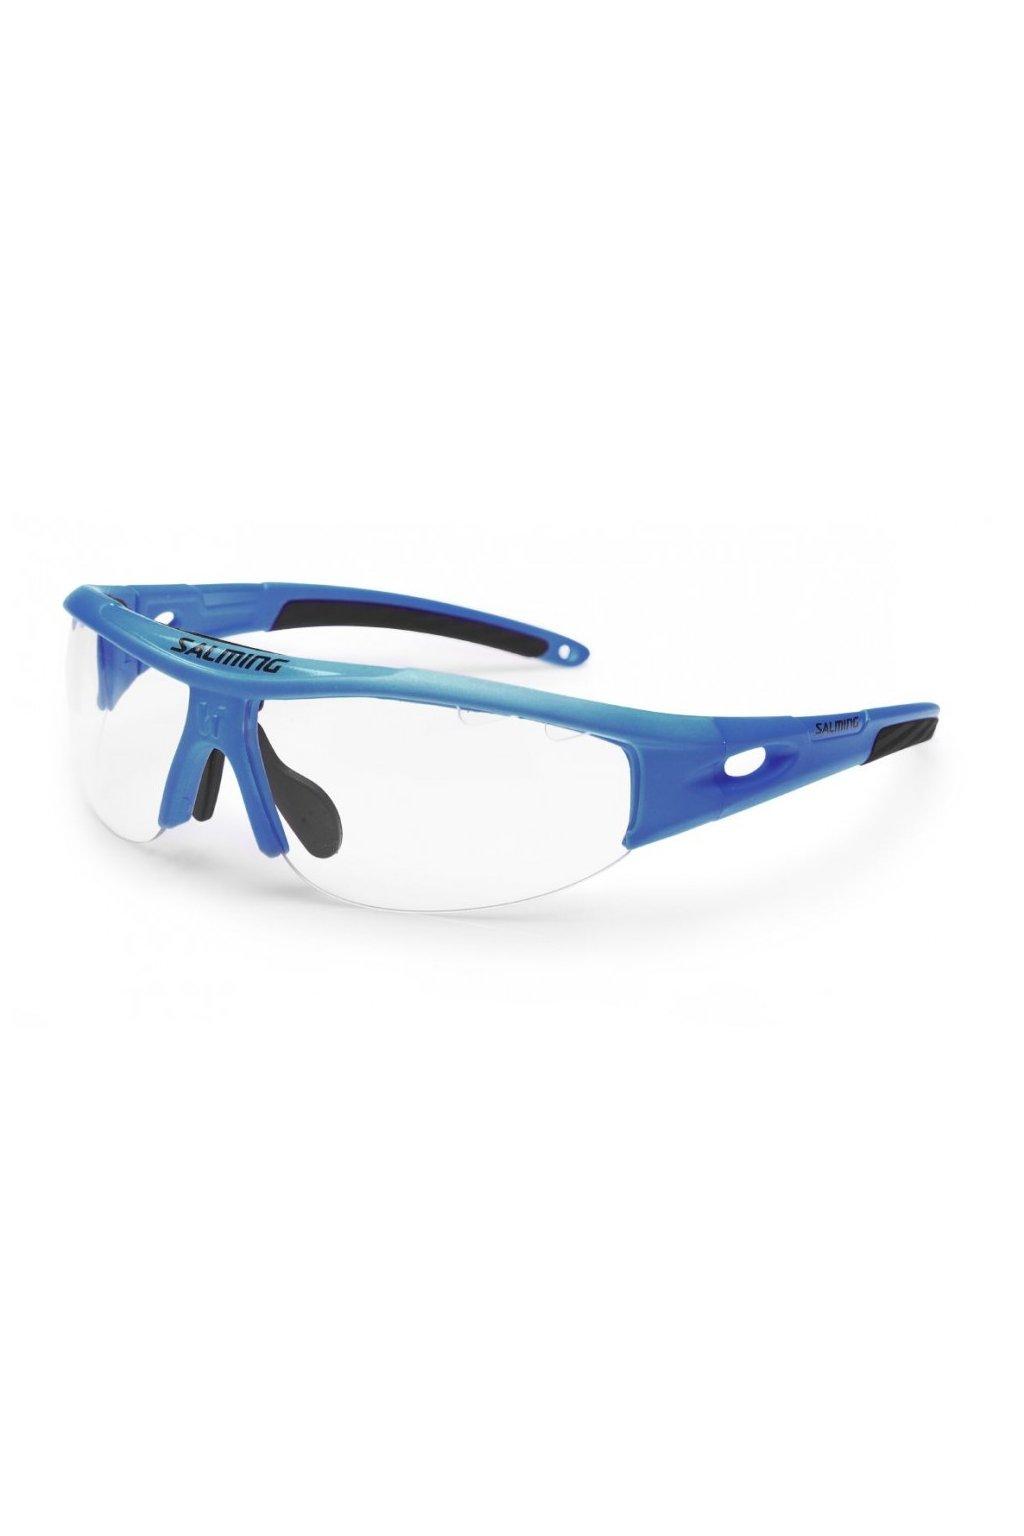 salming v1 protec eyewear jr royal blue